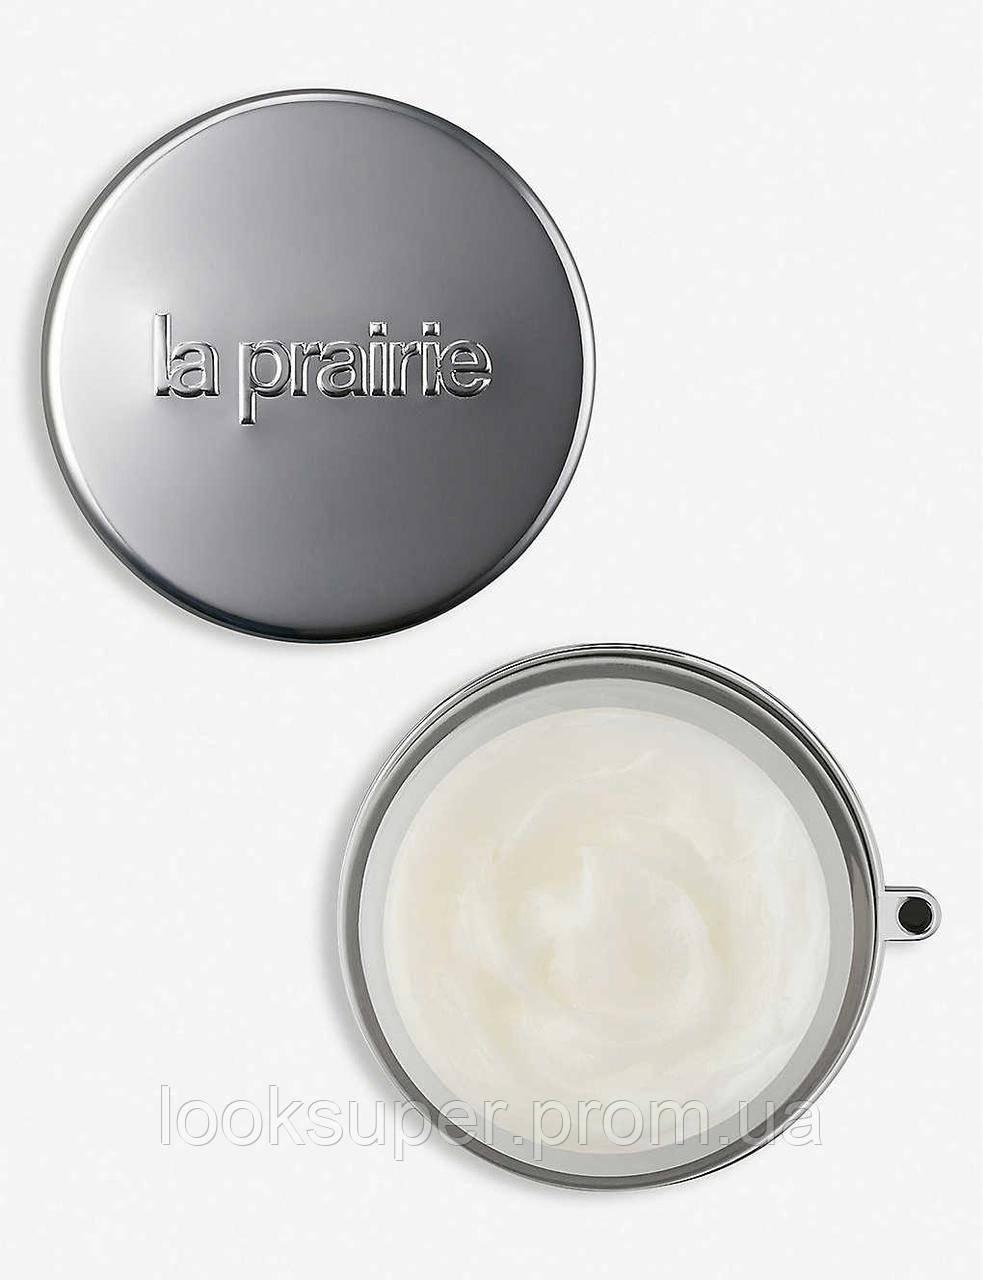 Очищающий бальзам La Prairie Supreme balm cleanser (100ml)